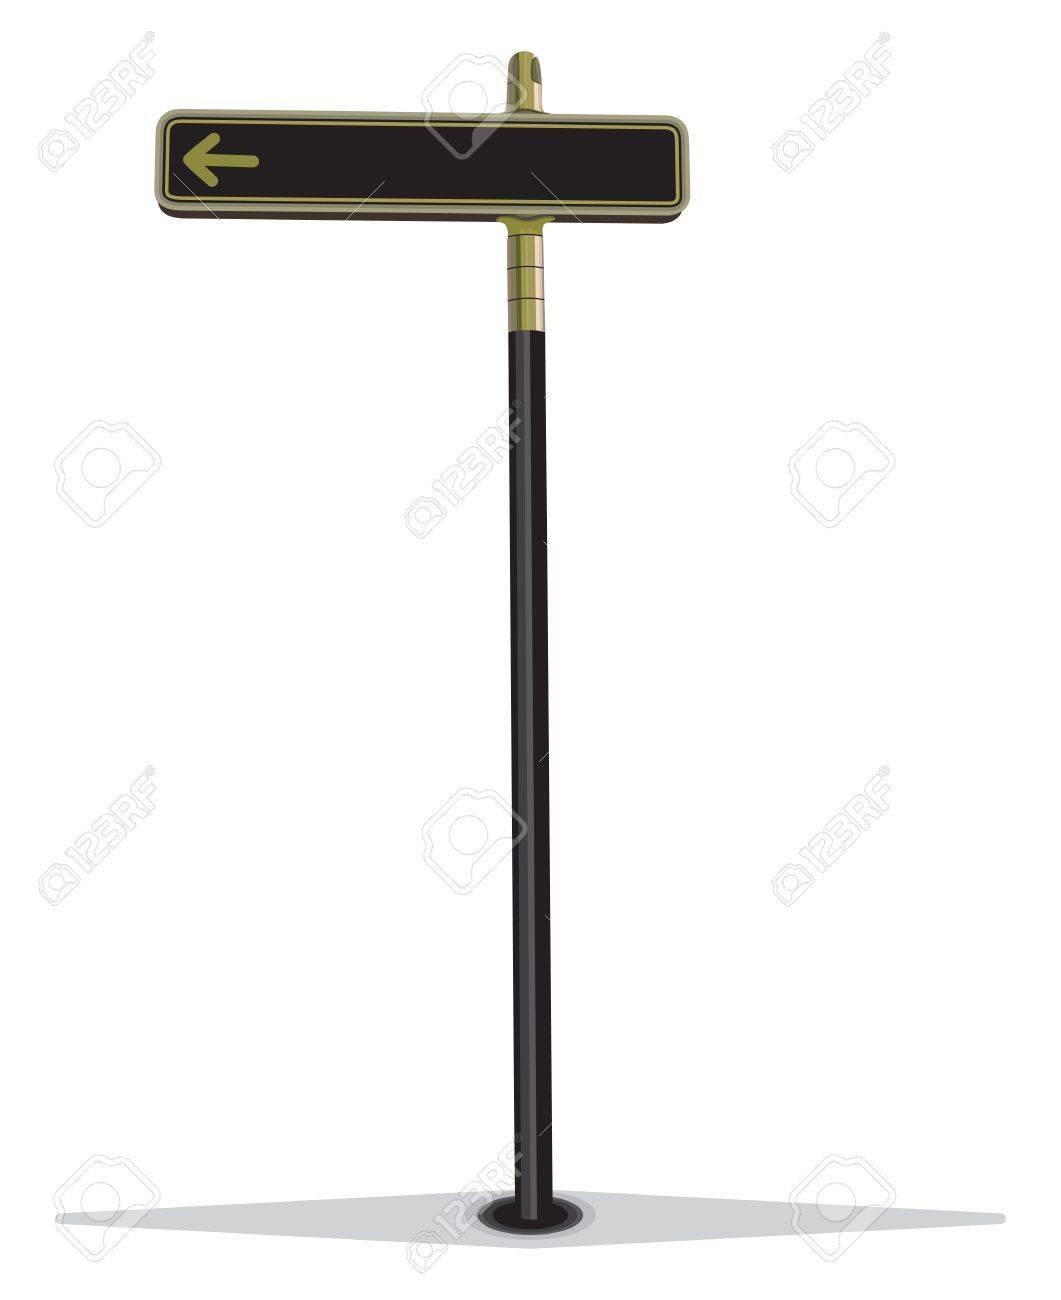 Blank street sign Stock Vector - 15825661